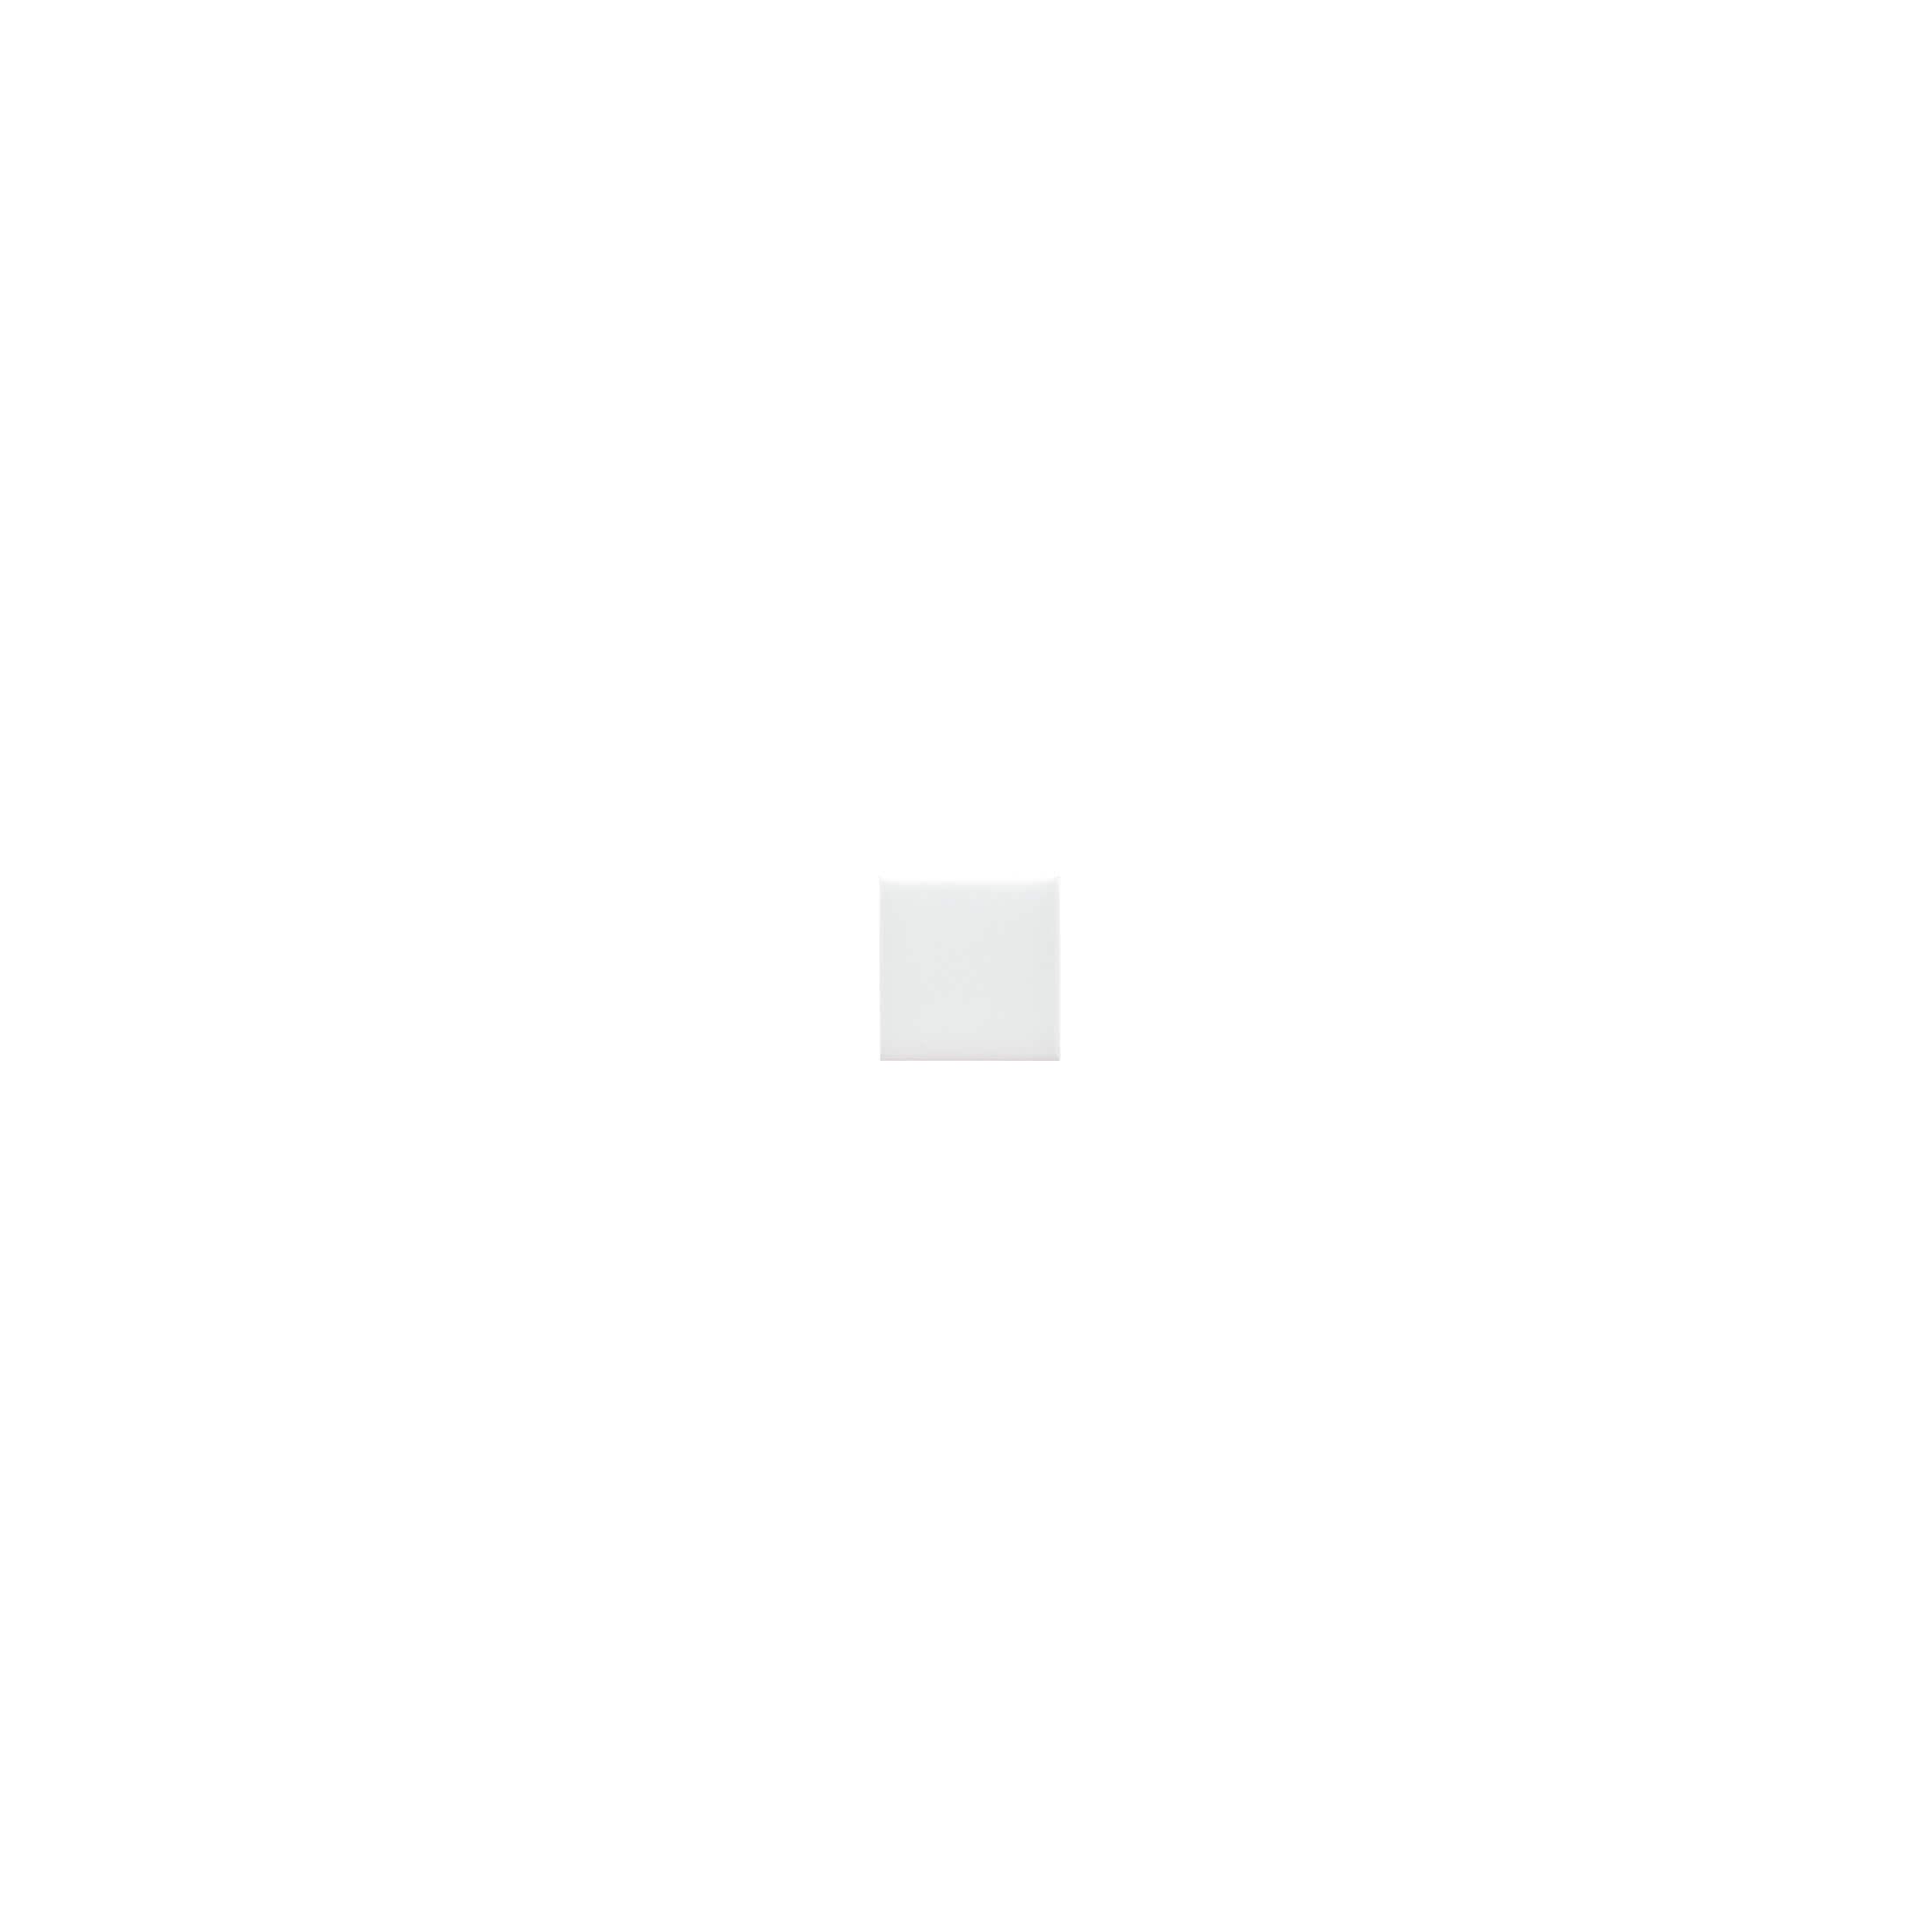 ADPV9004 - PAVIMENTO TACO BLANCO - 3 cm X 3 cm